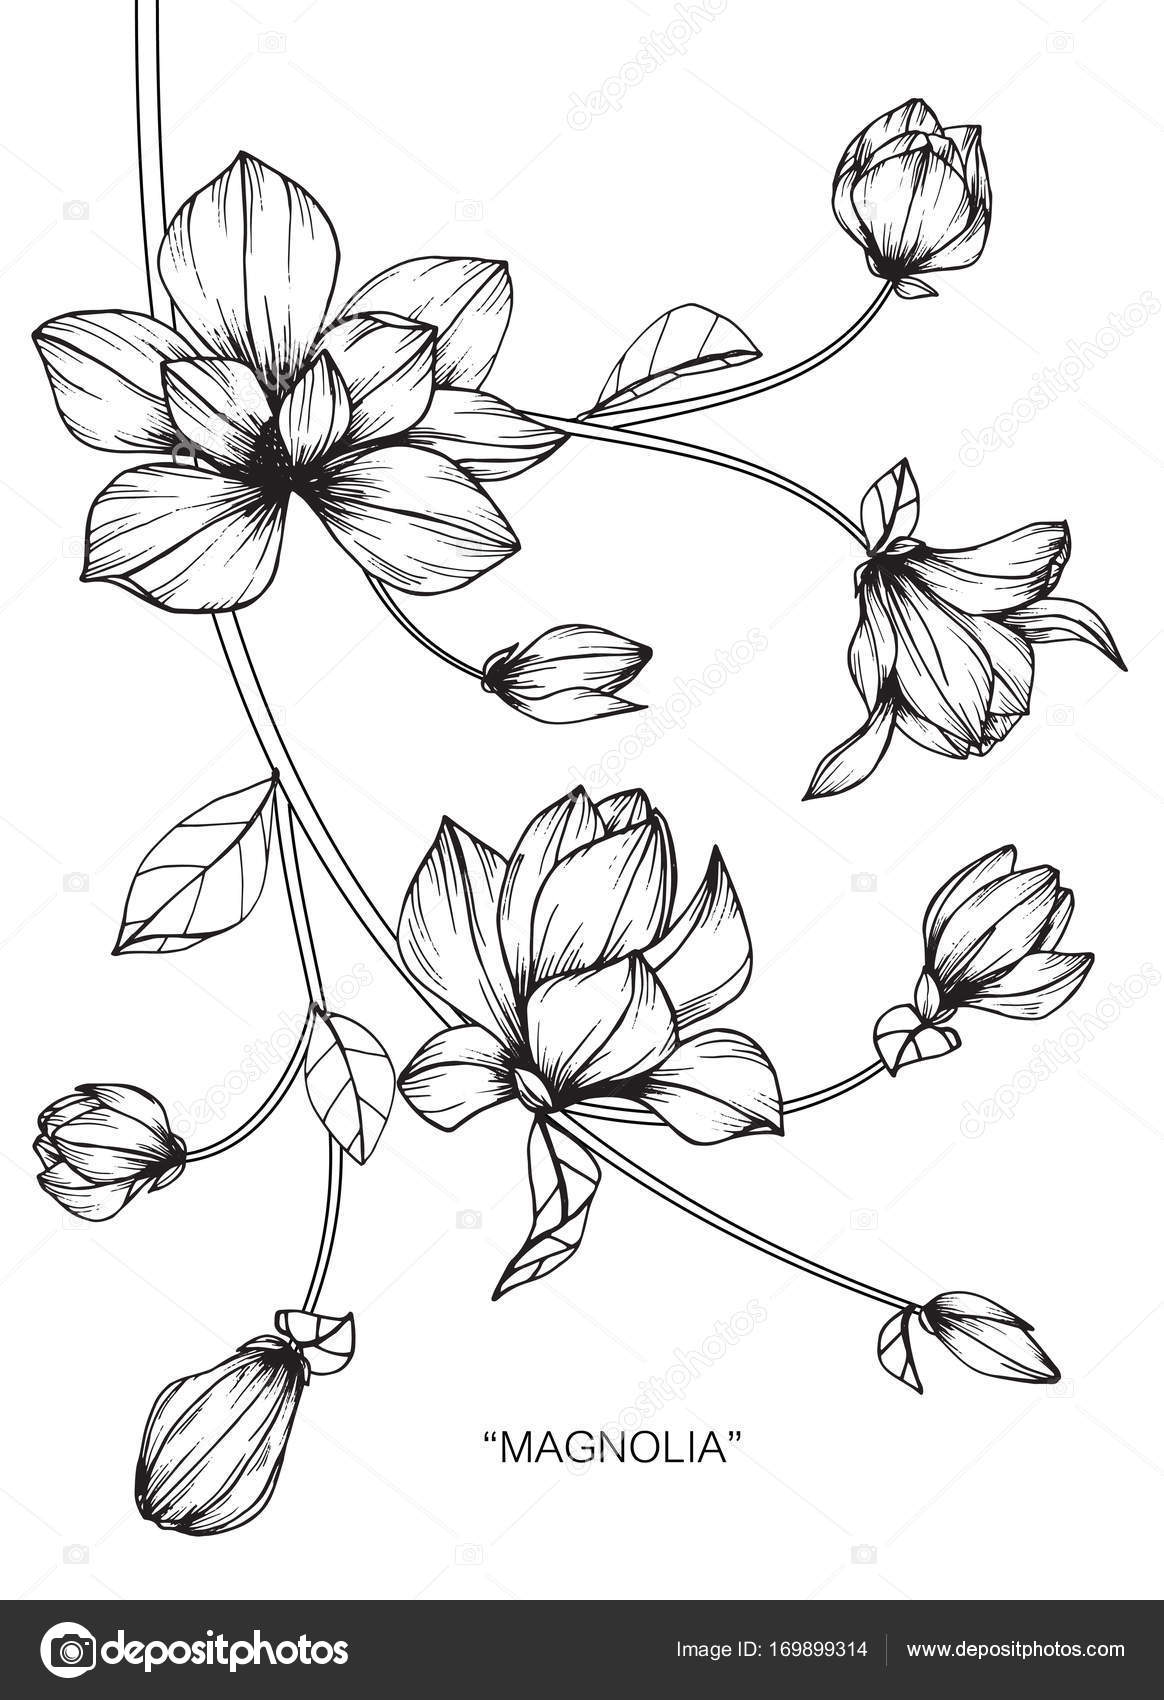 1164x1700 Magnolia Flower Drawing Sketch Black White Line Art Stock Vector